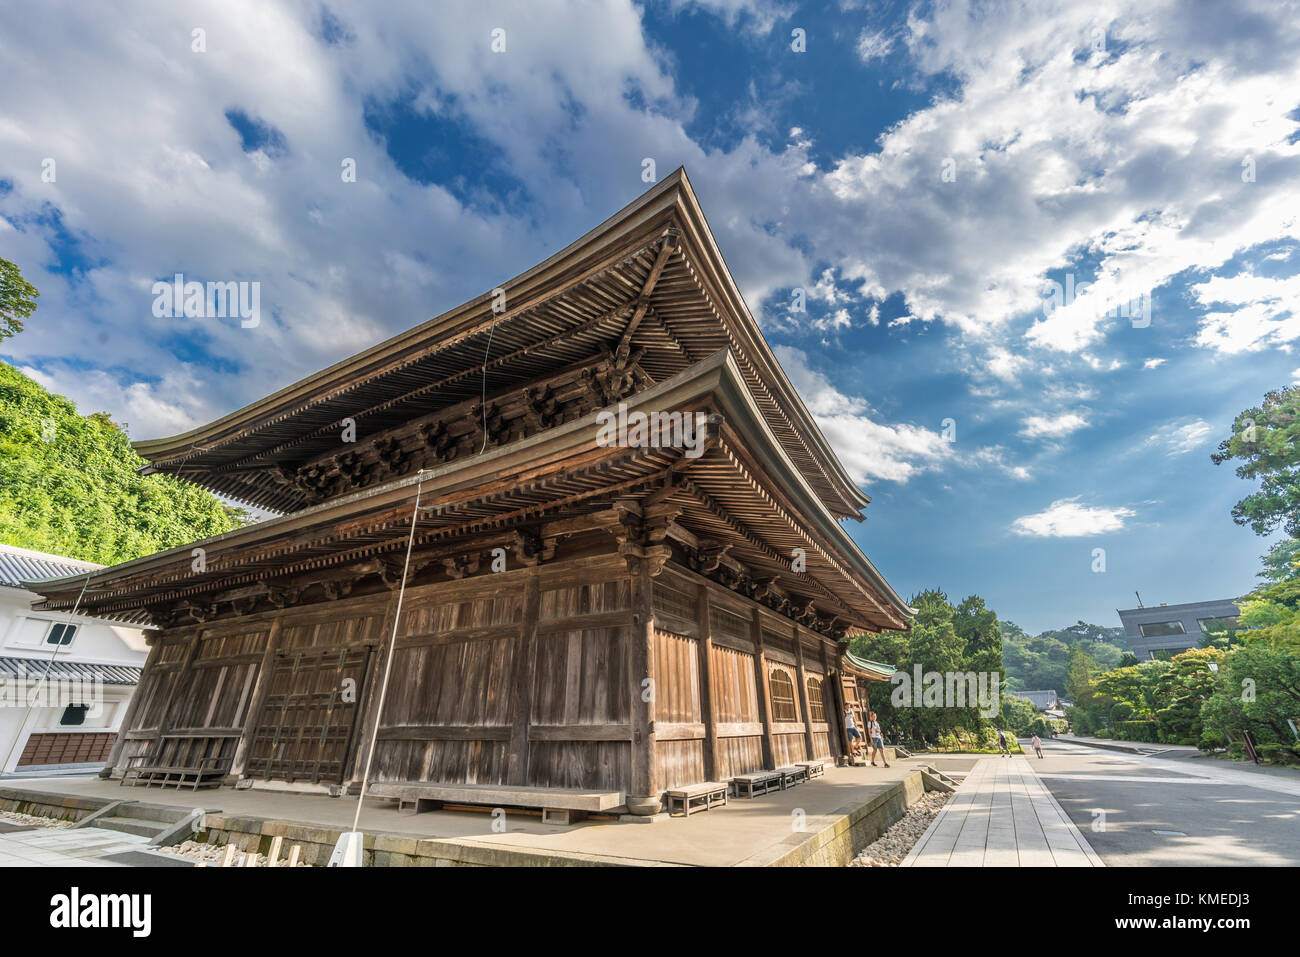 Kencho-ji temple,  Hatto (lecture hall) or Dharma Hall.  Kamakura, Kanagawa Prefecture, Japan - Stock Image